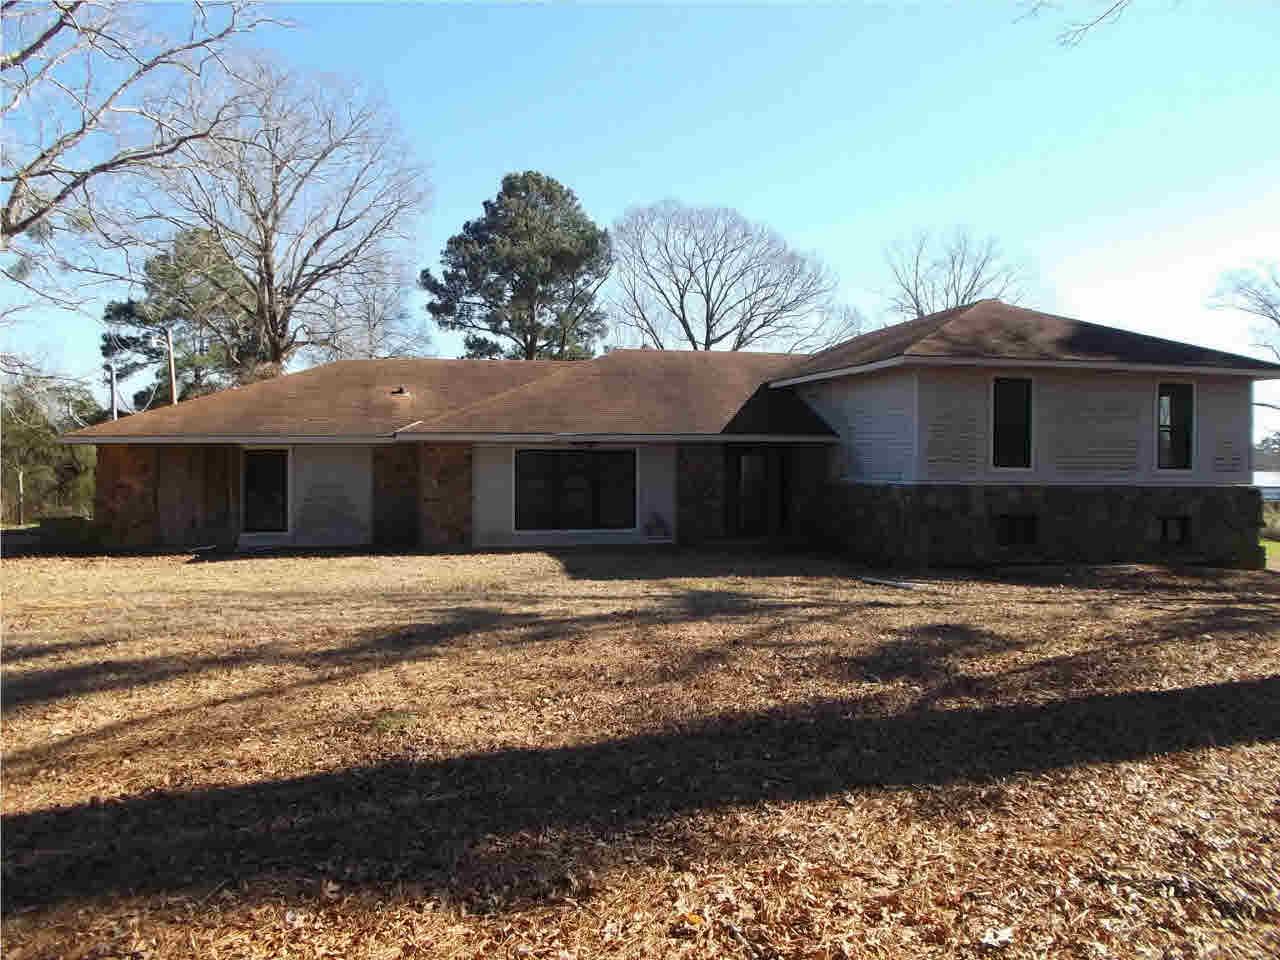 Real Estate for Sale, ListingId: 32546702, Newhebron,MS39140